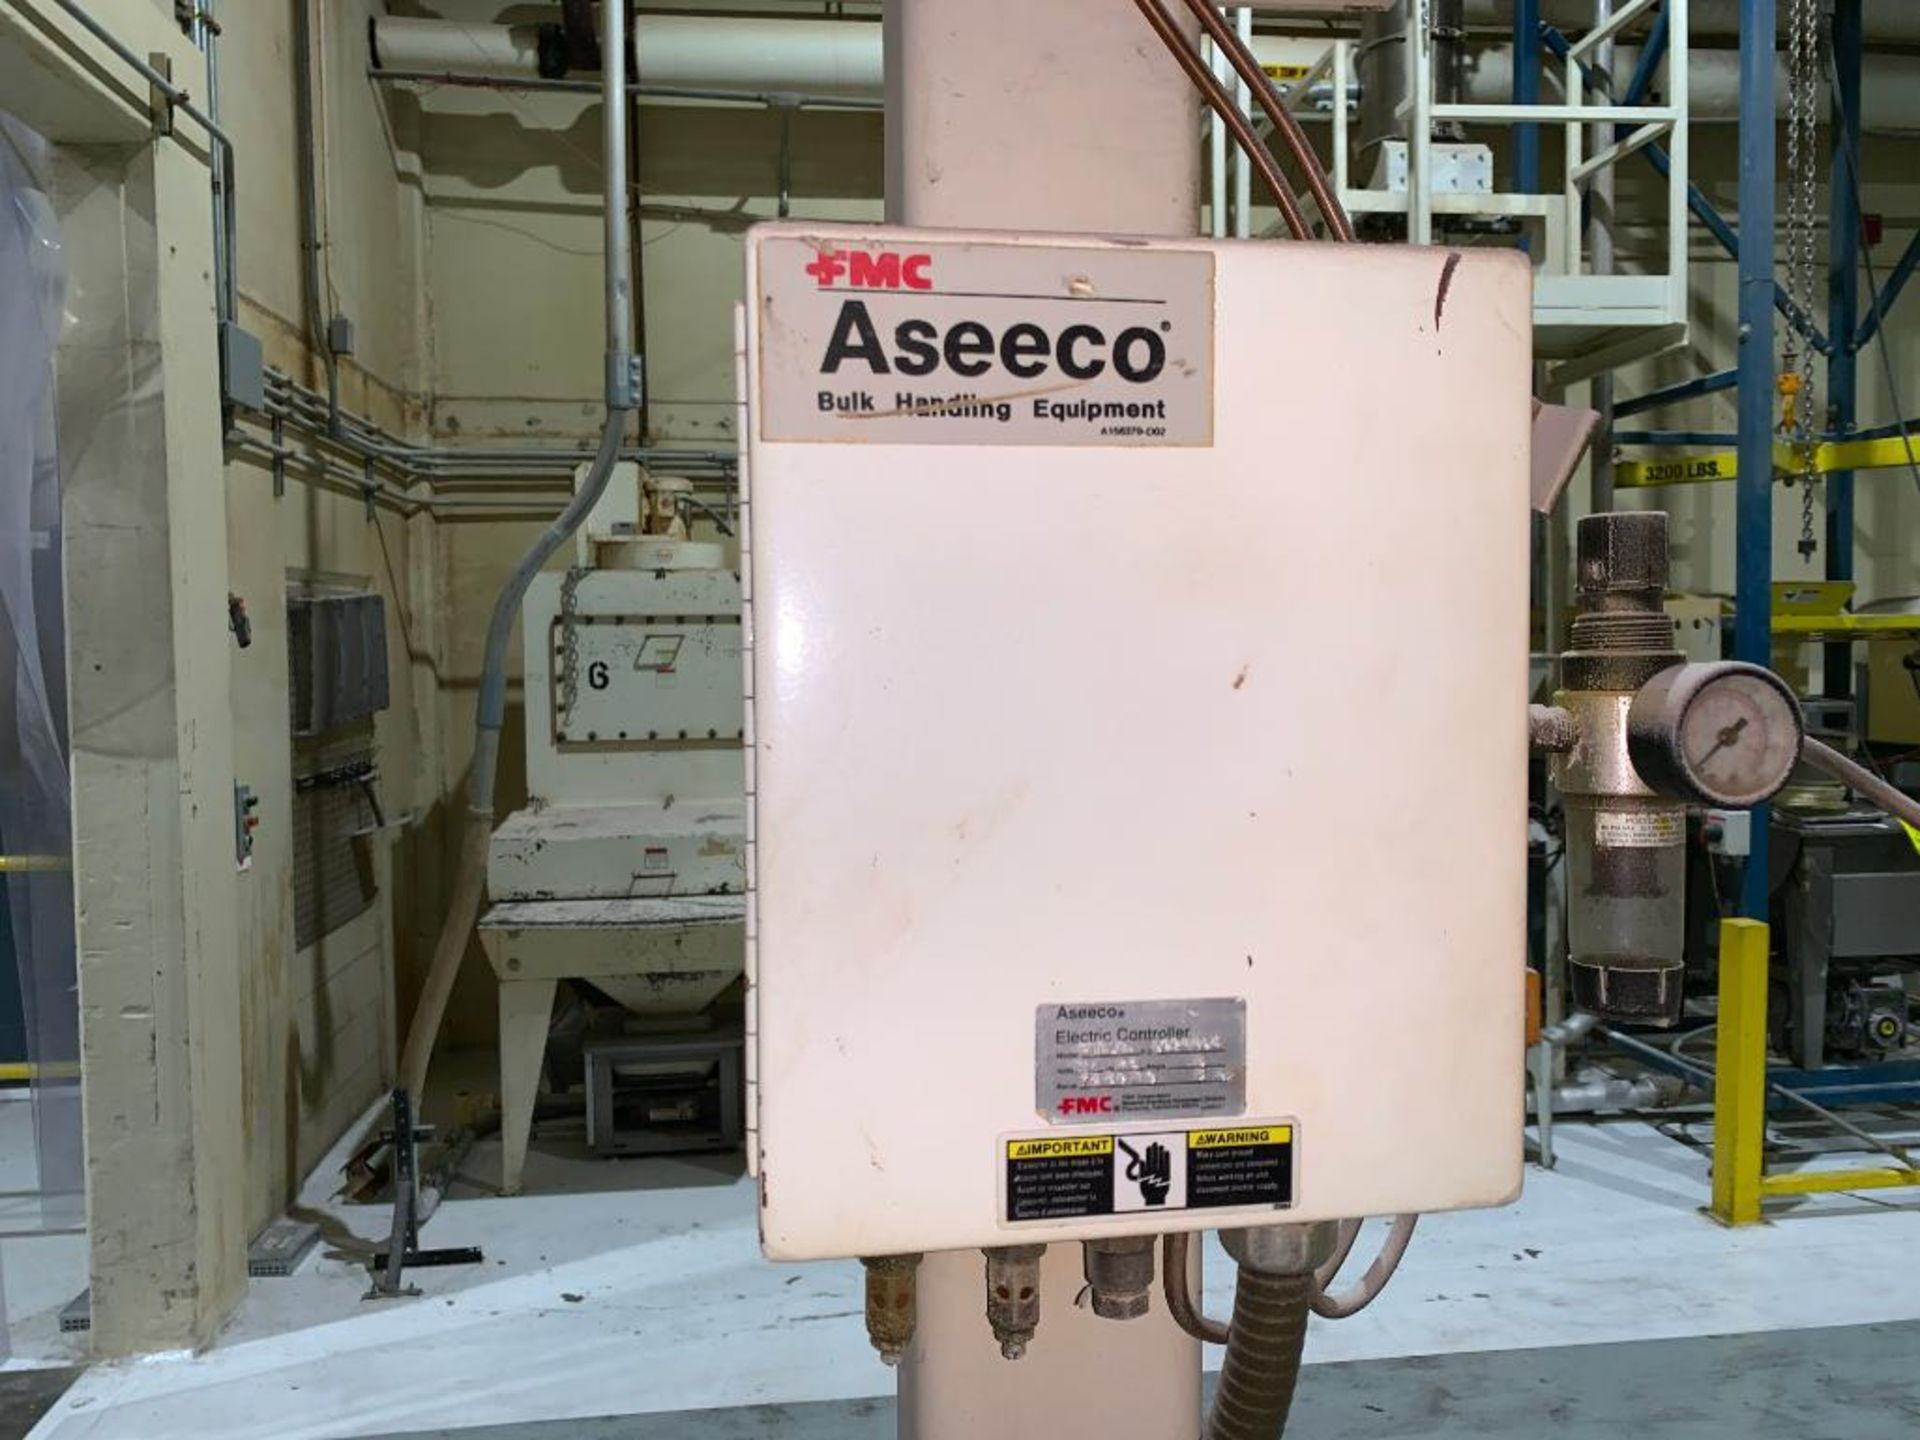 Aseeco mild steel cone bottom bulk storage bin - Image 11 of 16